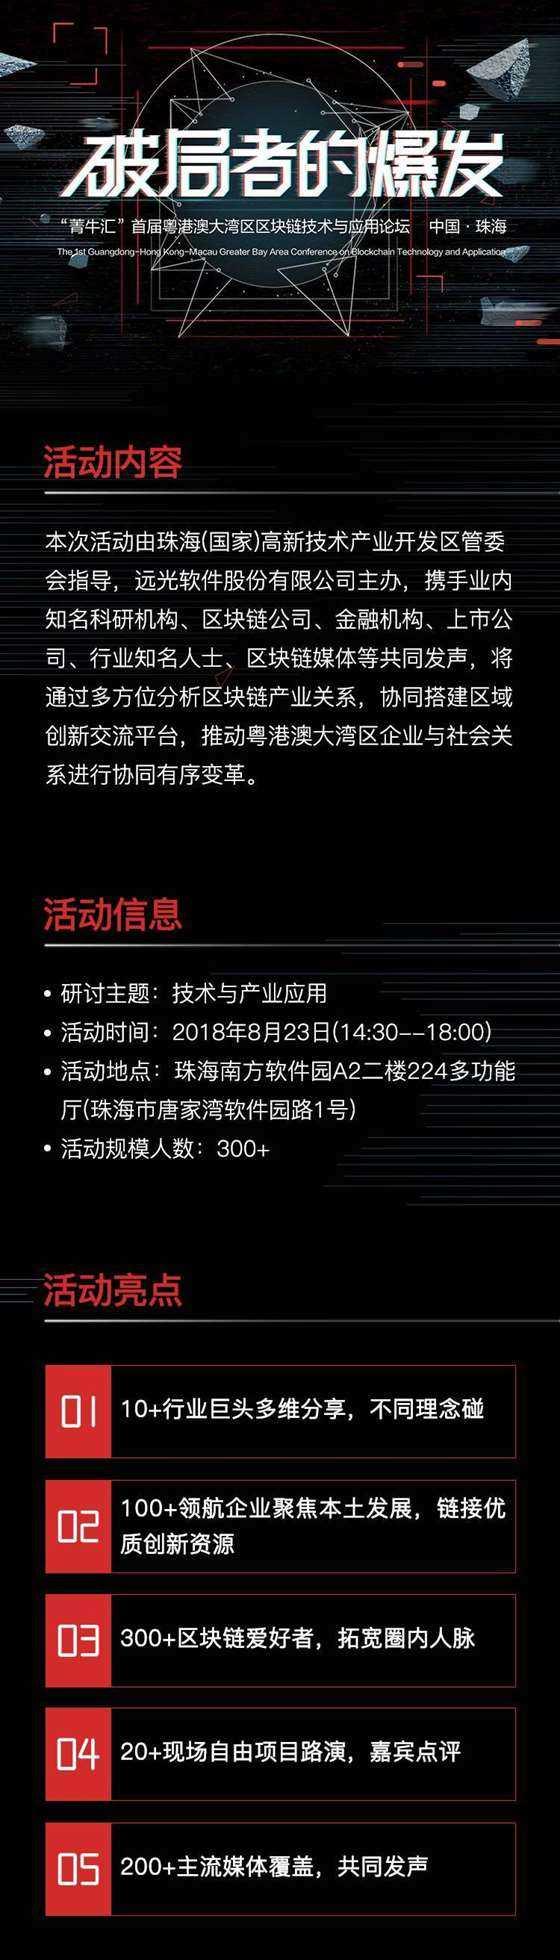 http://www.huodongxing.com/file/20171201/7022891666594/813140600981419.jpg